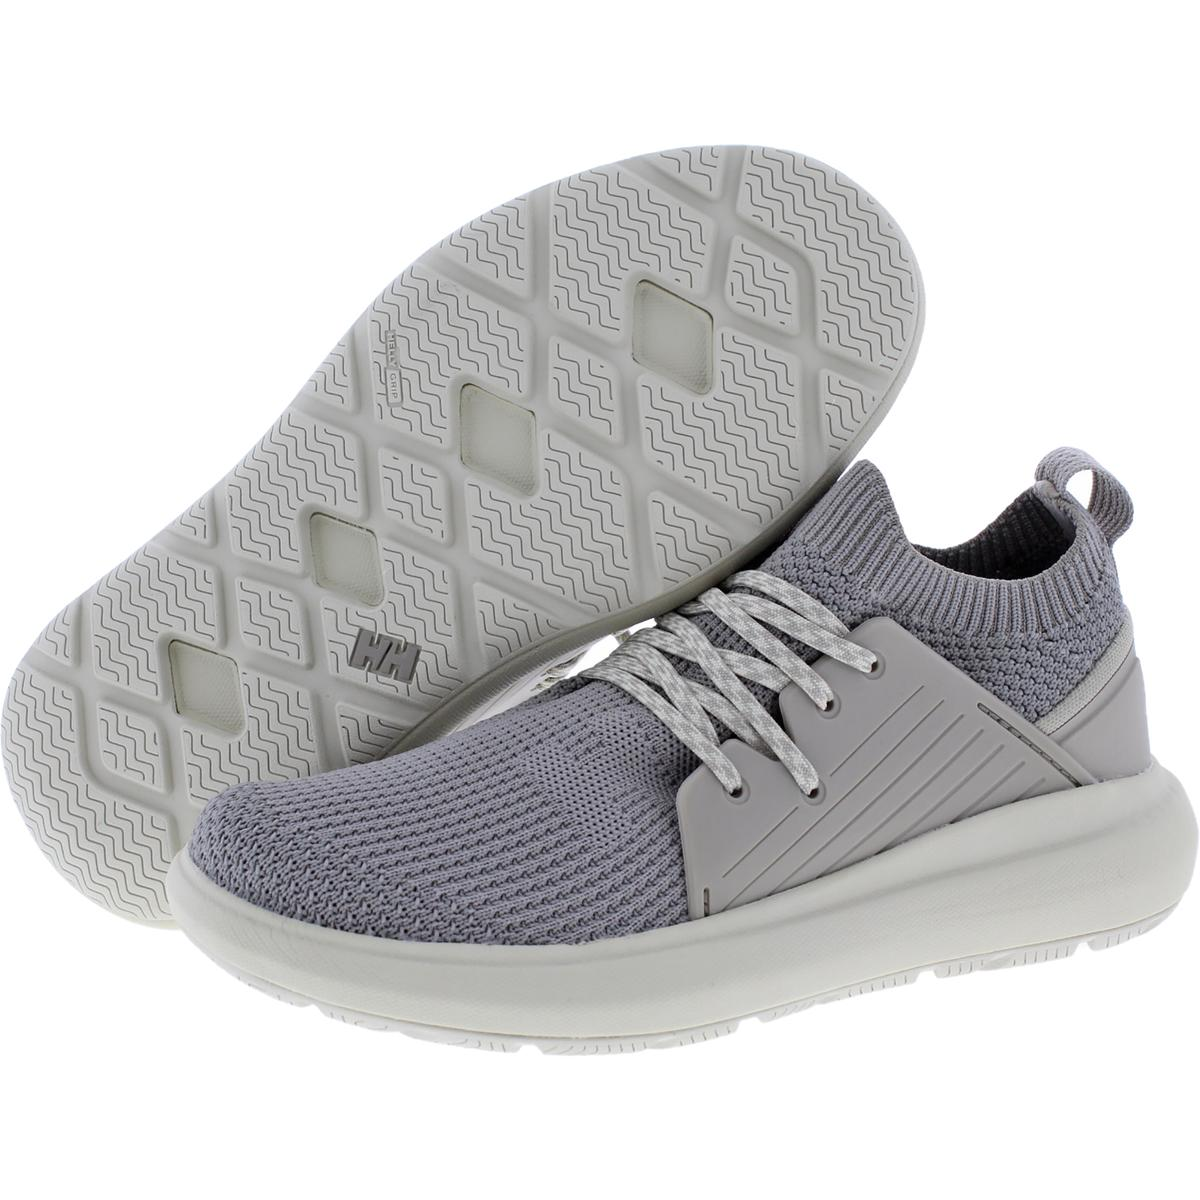 thumbnail 8 - Helly-Hansen-Womens-Razorskiff-Knit-Breathable-Fashion-Sneakers-Shoes-BHFO-8932